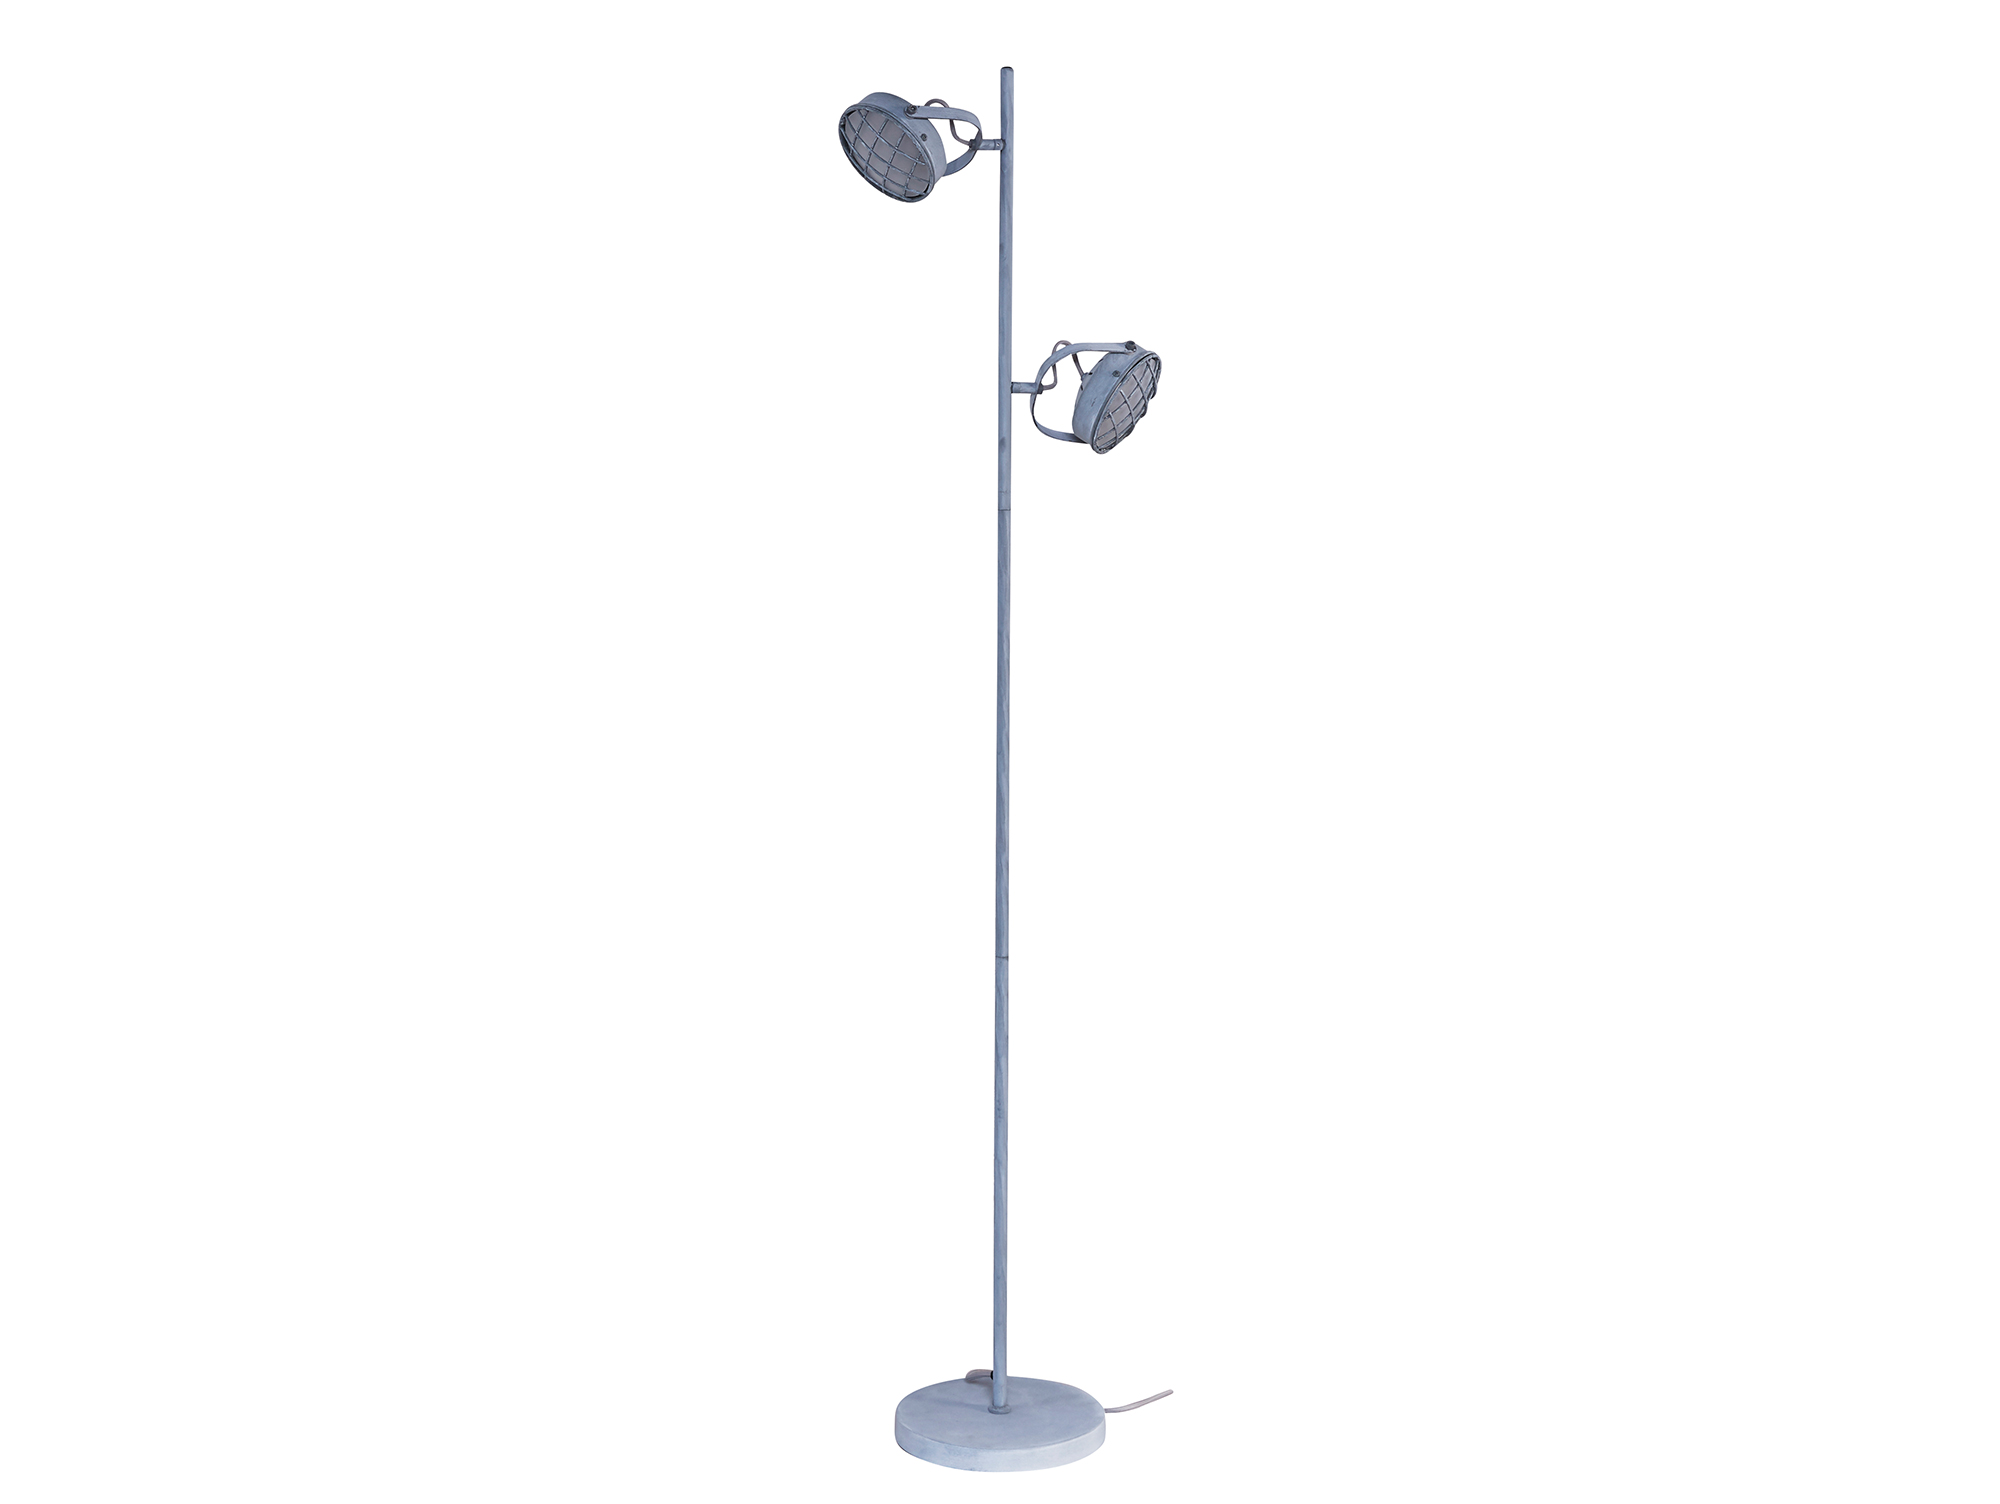 stehlampe grau affordable stehlampe grau stehlampen von loistaa und andere lampen fa r. Black Bedroom Furniture Sets. Home Design Ideas